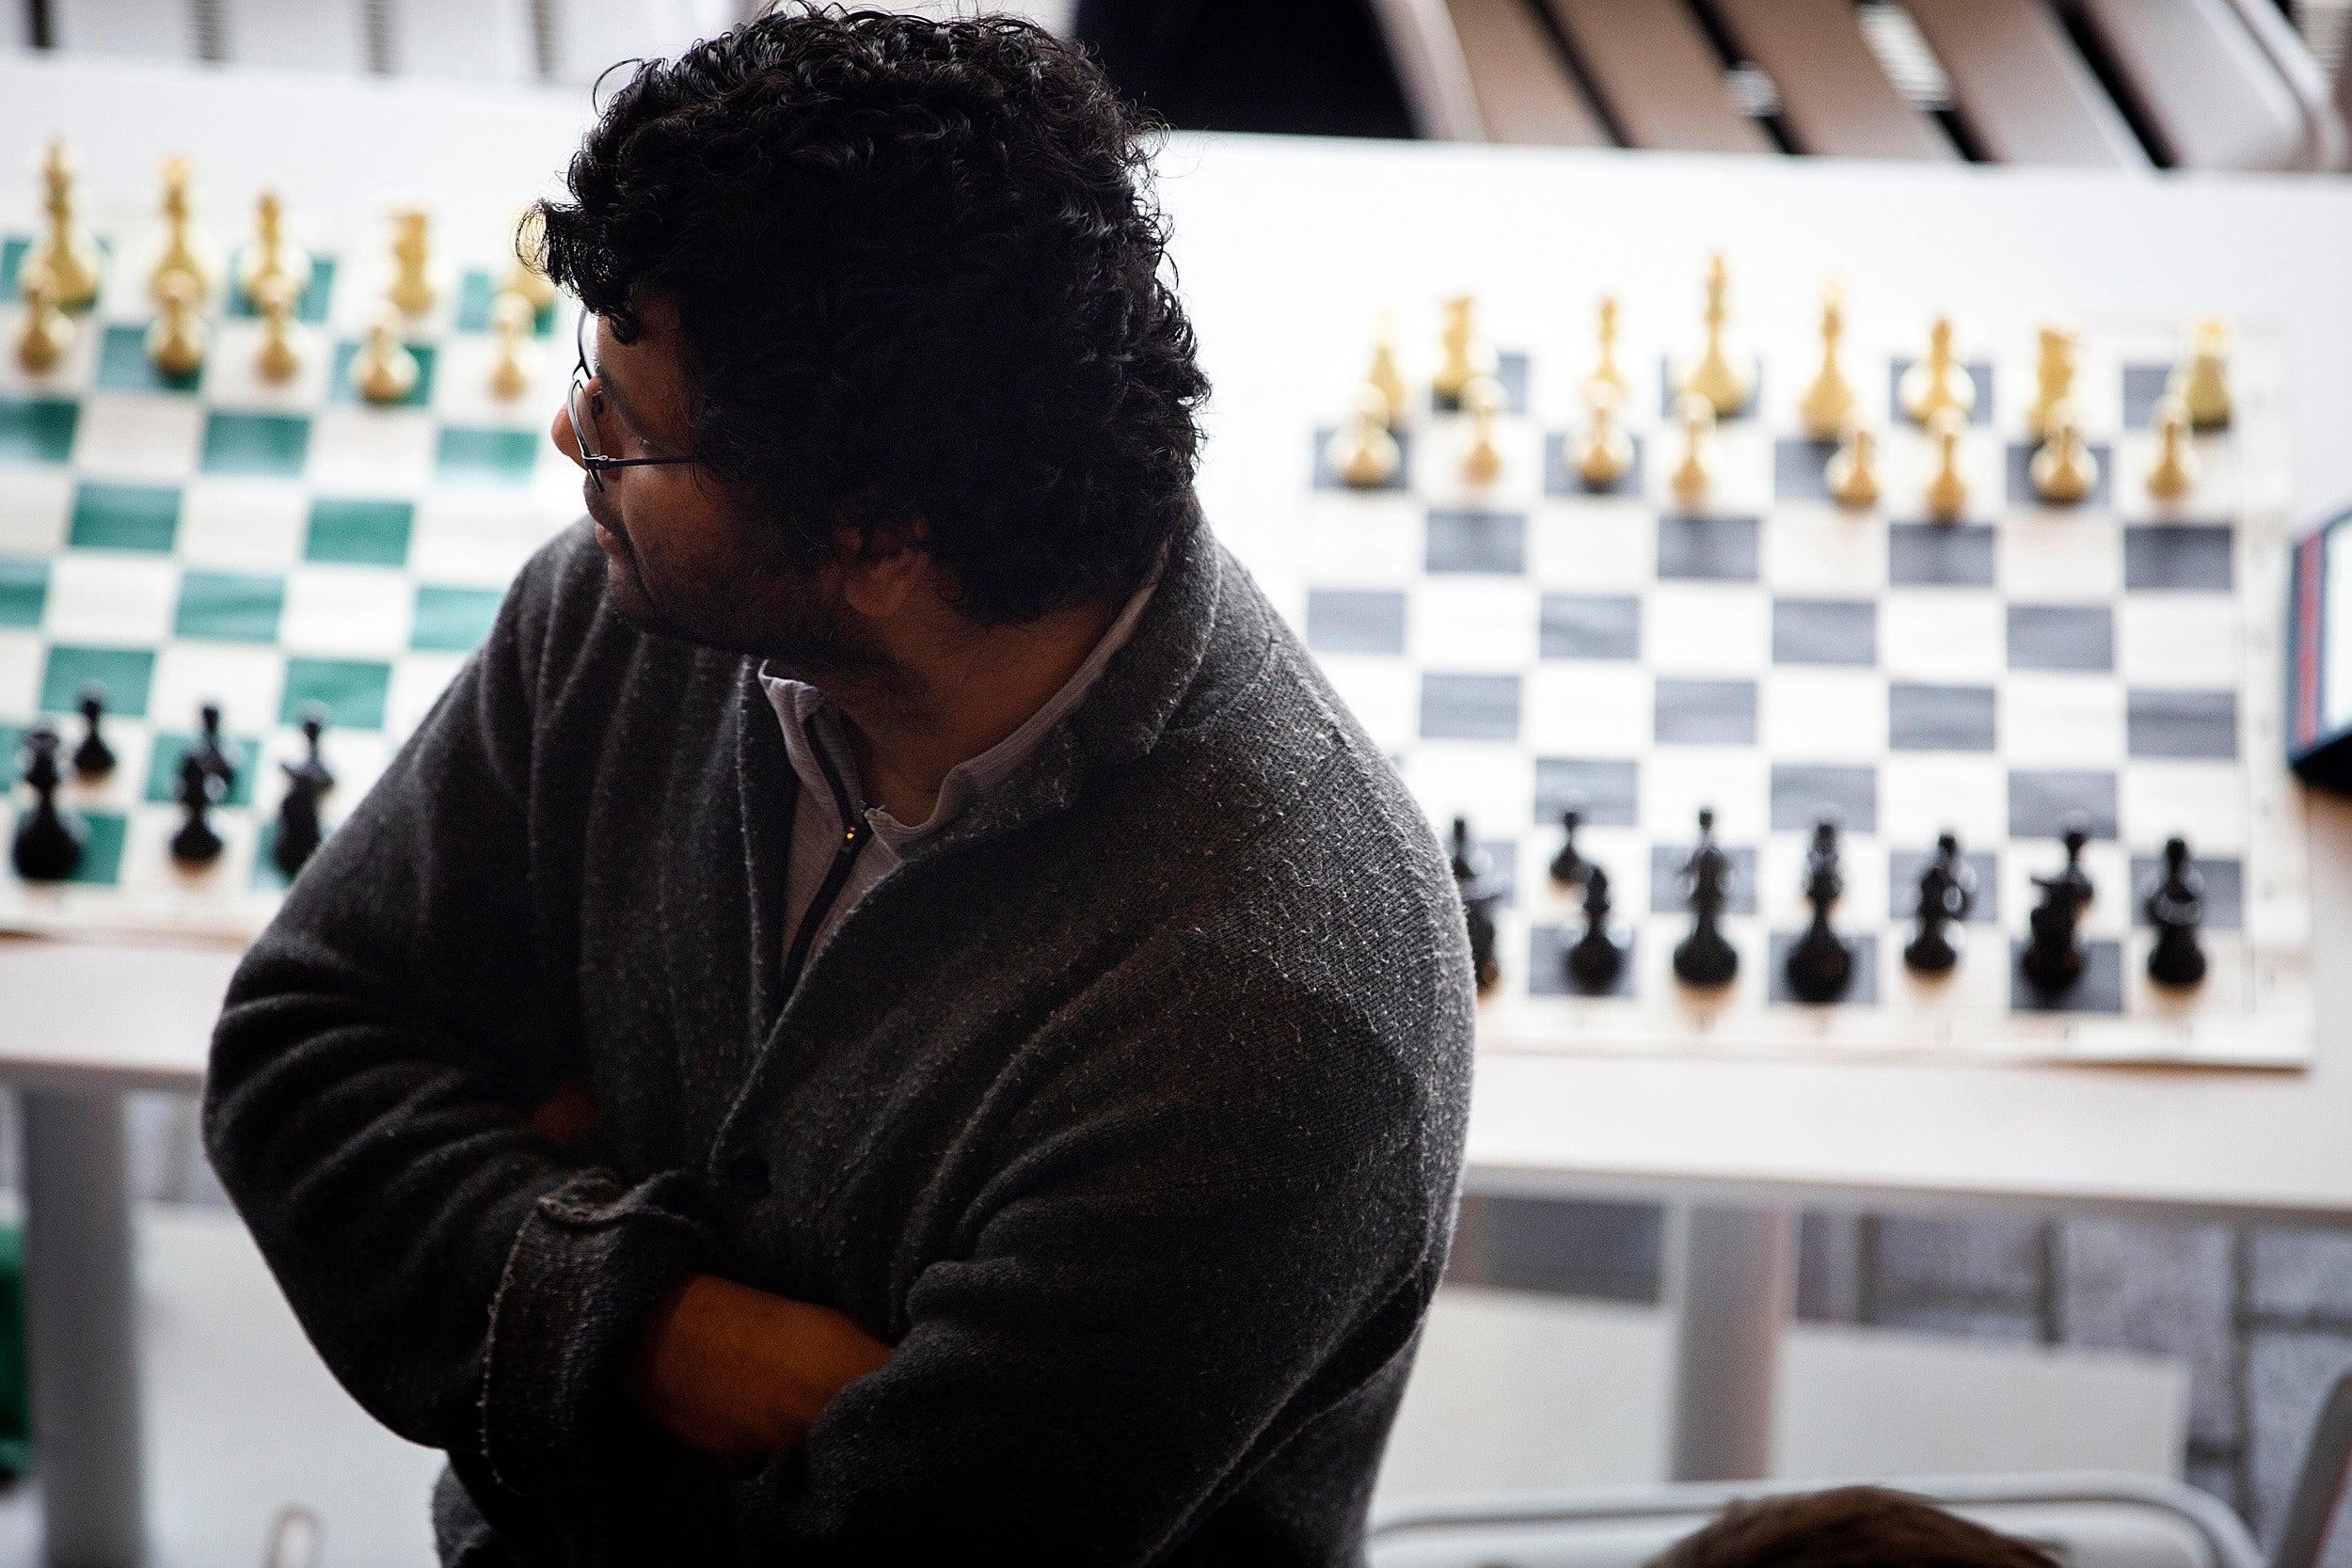 Natesh Pillai takes a break between chess matches.